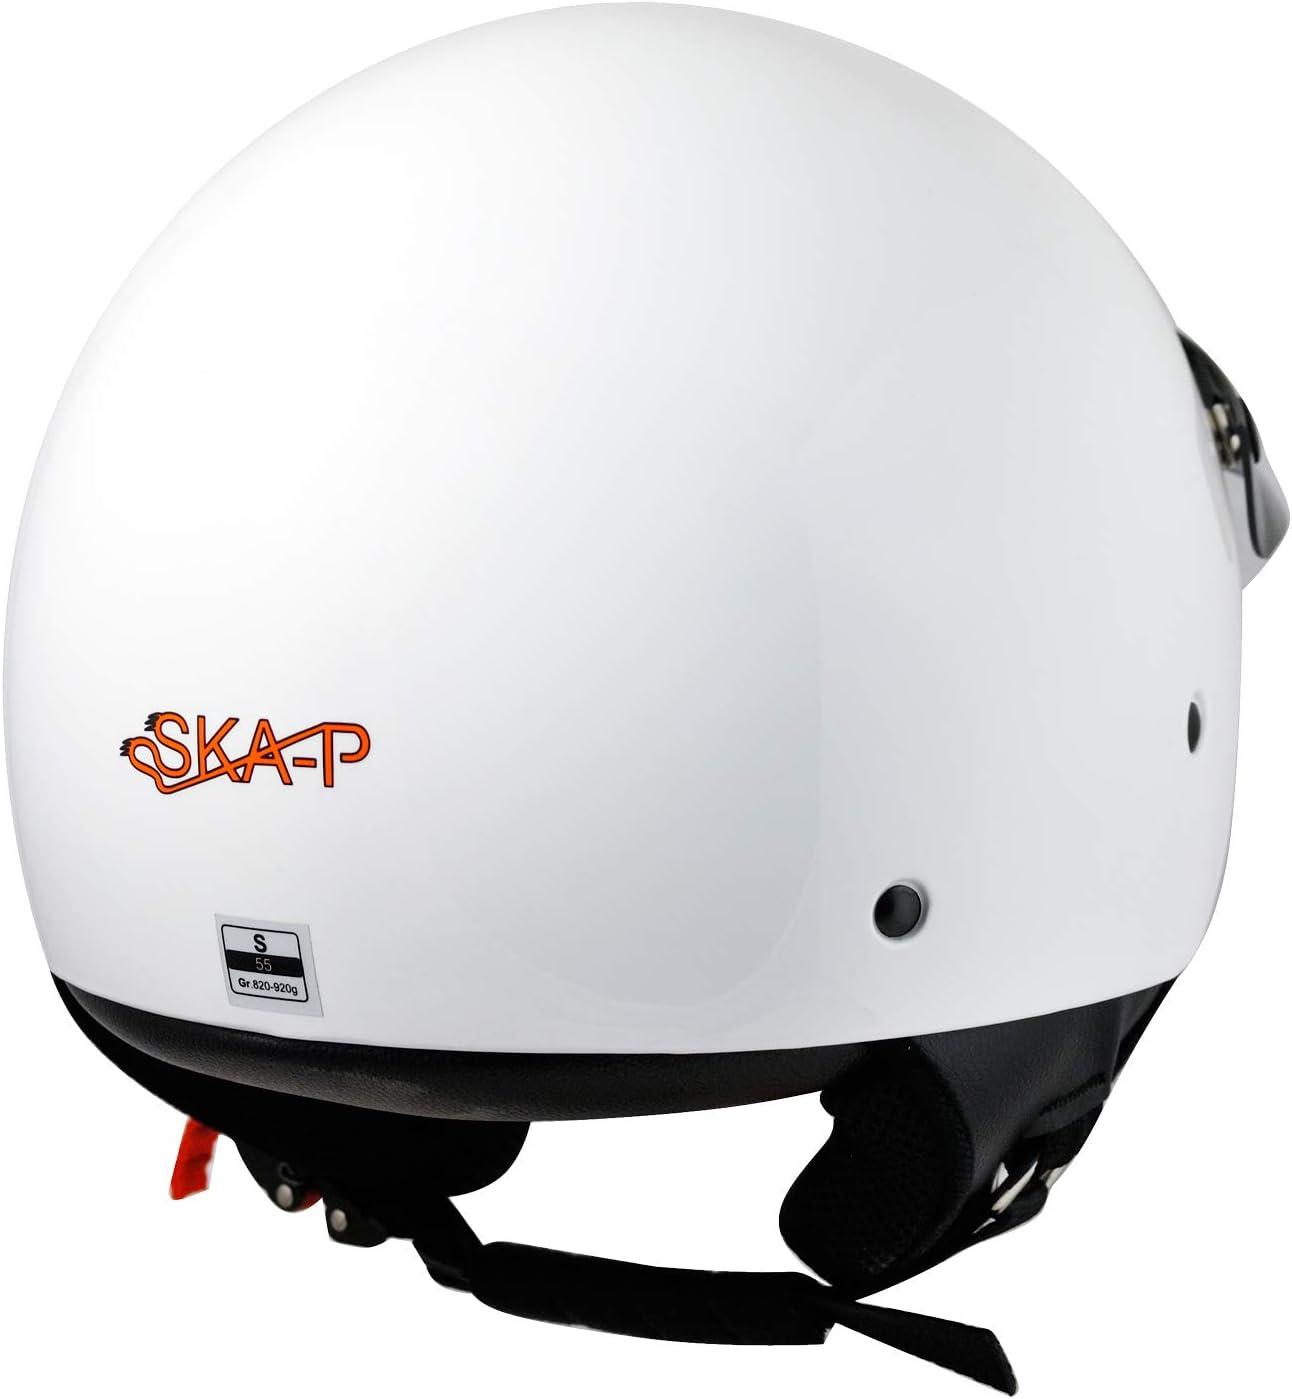 Demi Jet Helmet SKA-P 1FH SMARTY XS 53-54cm Black